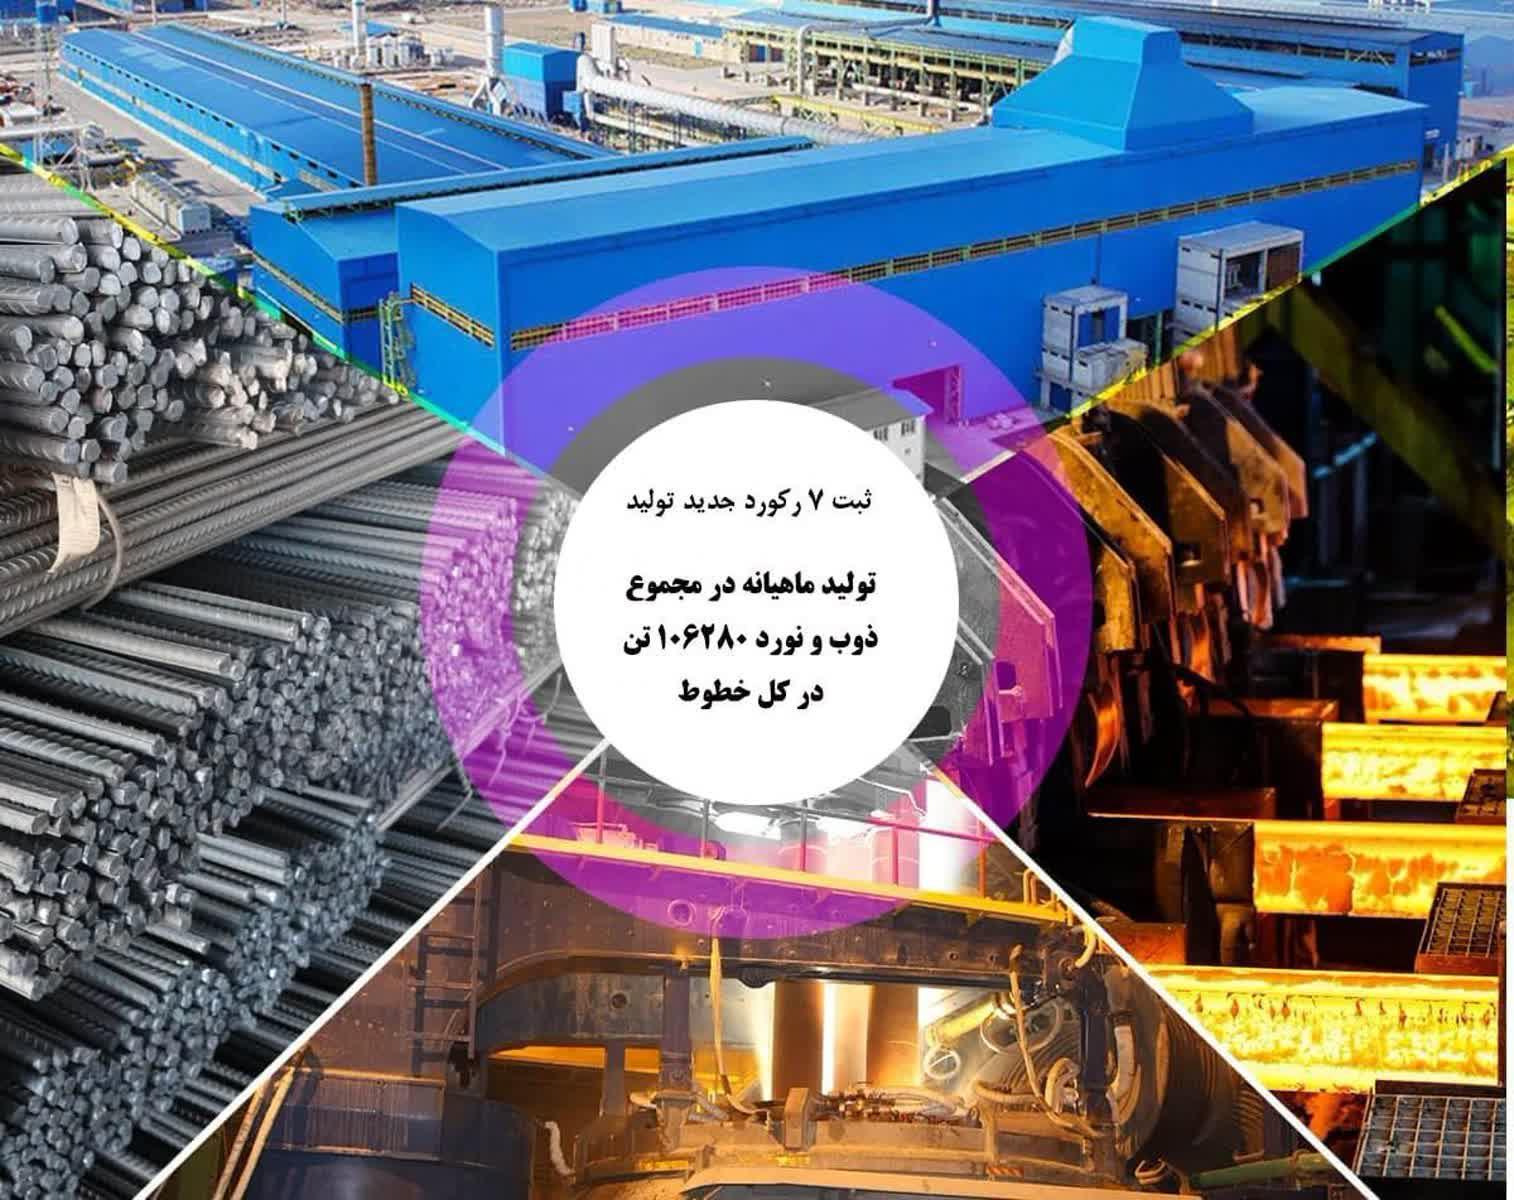 ثبت 7 ركورد جديد توليد در مجتمع فولاد صنعت بناب